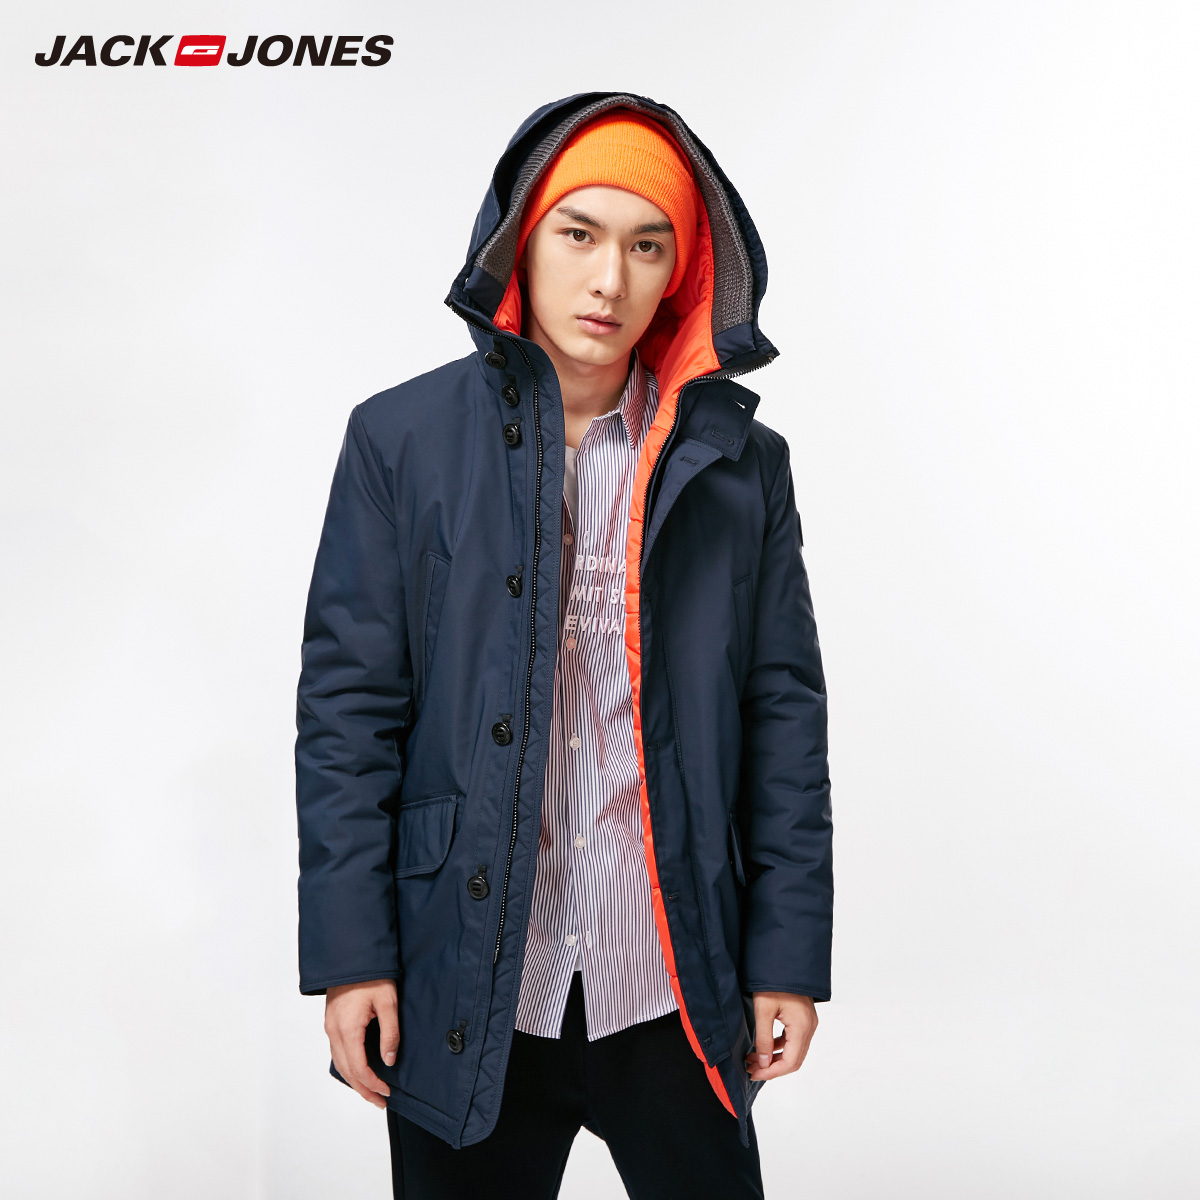 JACK JONES 杰克琼斯 218309511 男士连帽棉服夹克